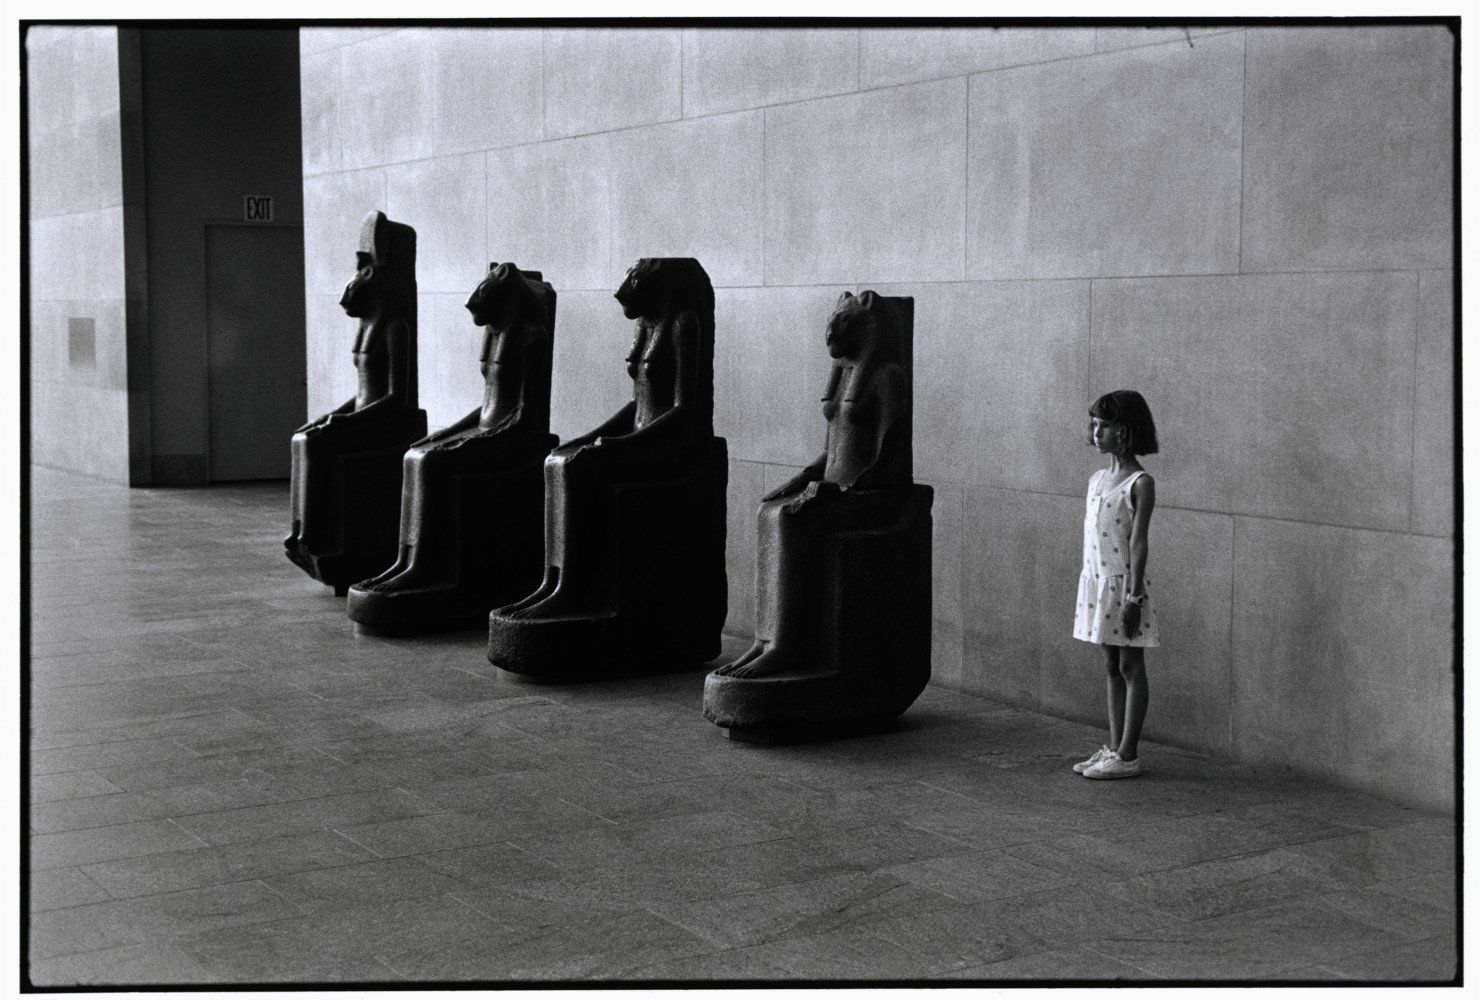 The Art of Looking at Art • Elliott Erwitt